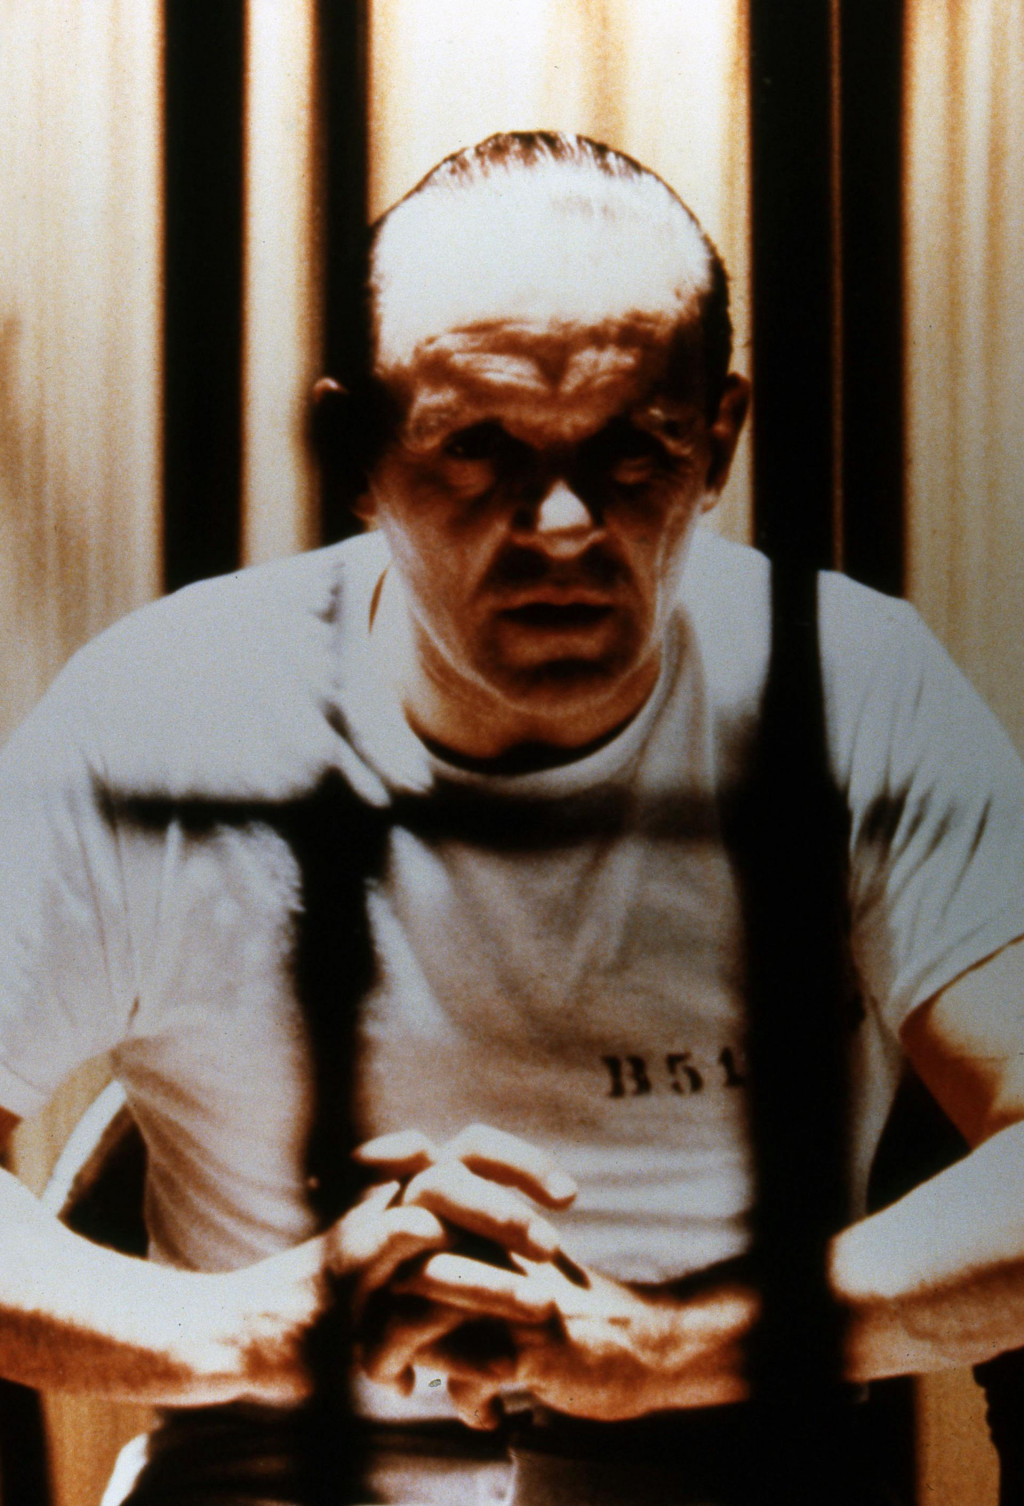 Anthony Hopkins: Retroaktivno bi mogao postati nepodoban za svoju slavnu ulogu Hannibala Lectera jer - koliko se zna - nije ni psihopat ni ubojica